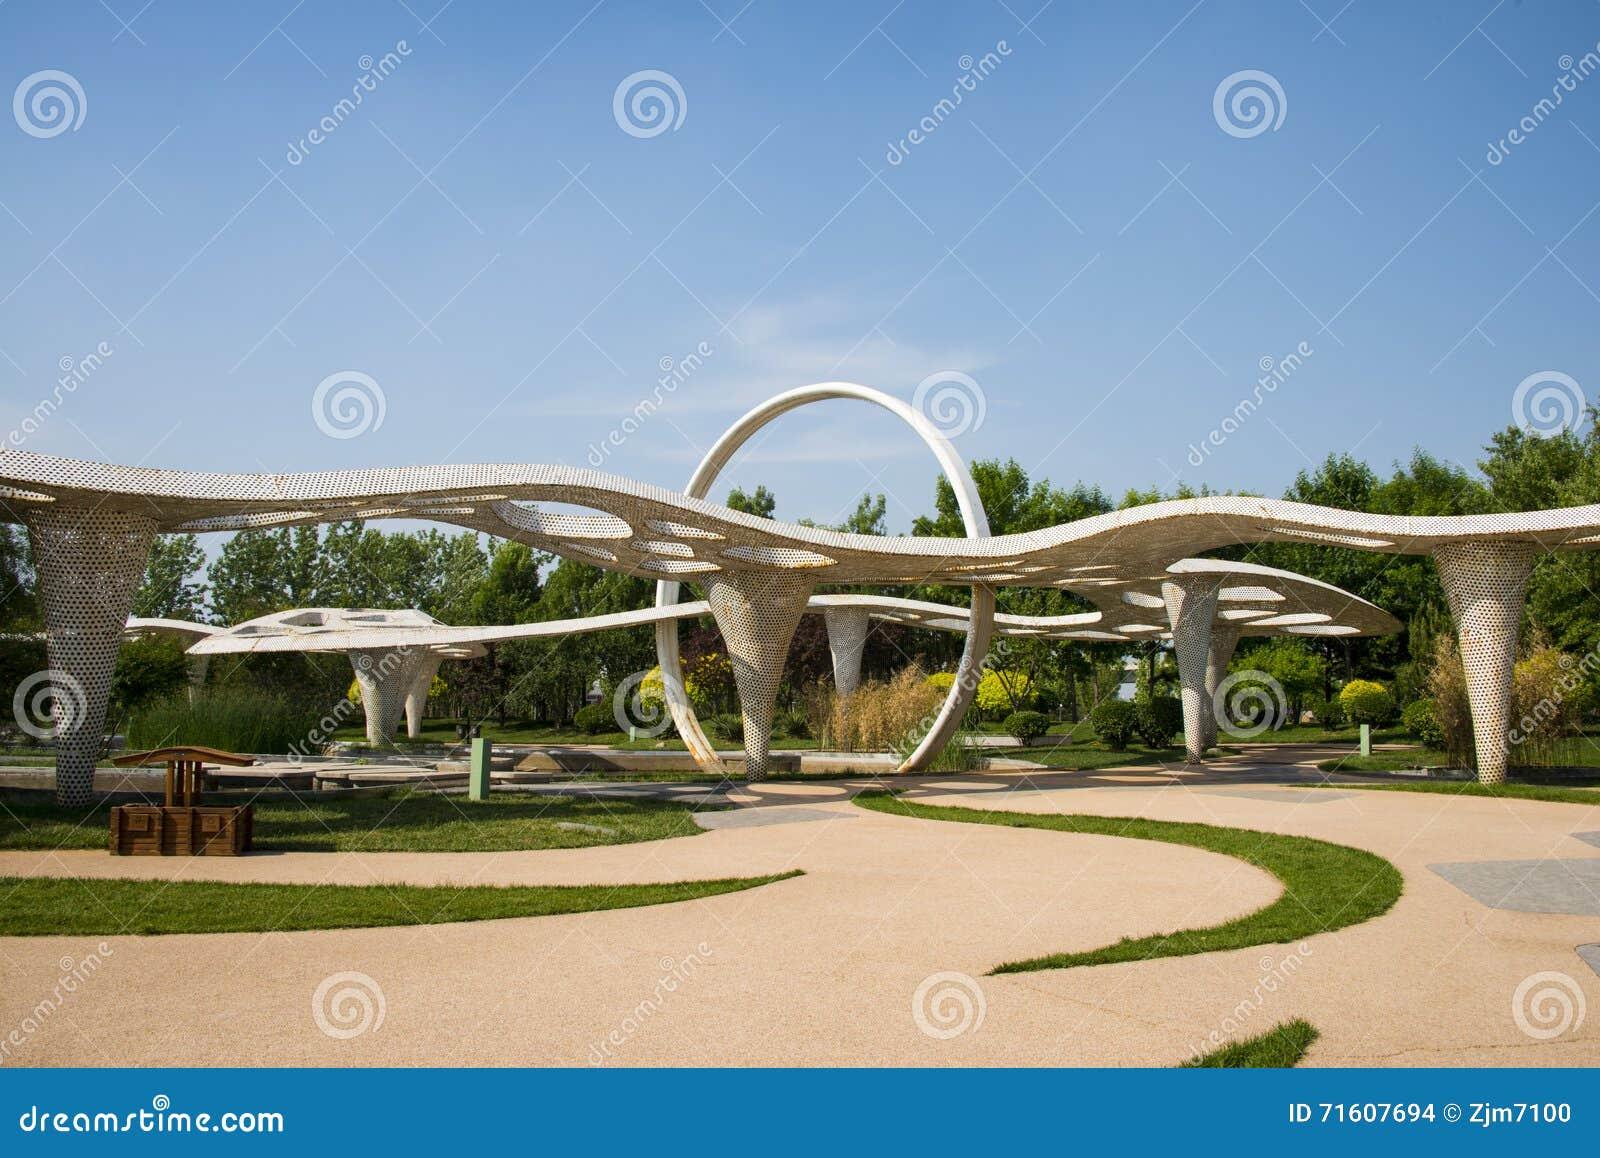 Azi chinees peking tuin expo moderne architectuur paviljoen redactionele stock afbeelding - Moderne landschapsarchitectuur ...